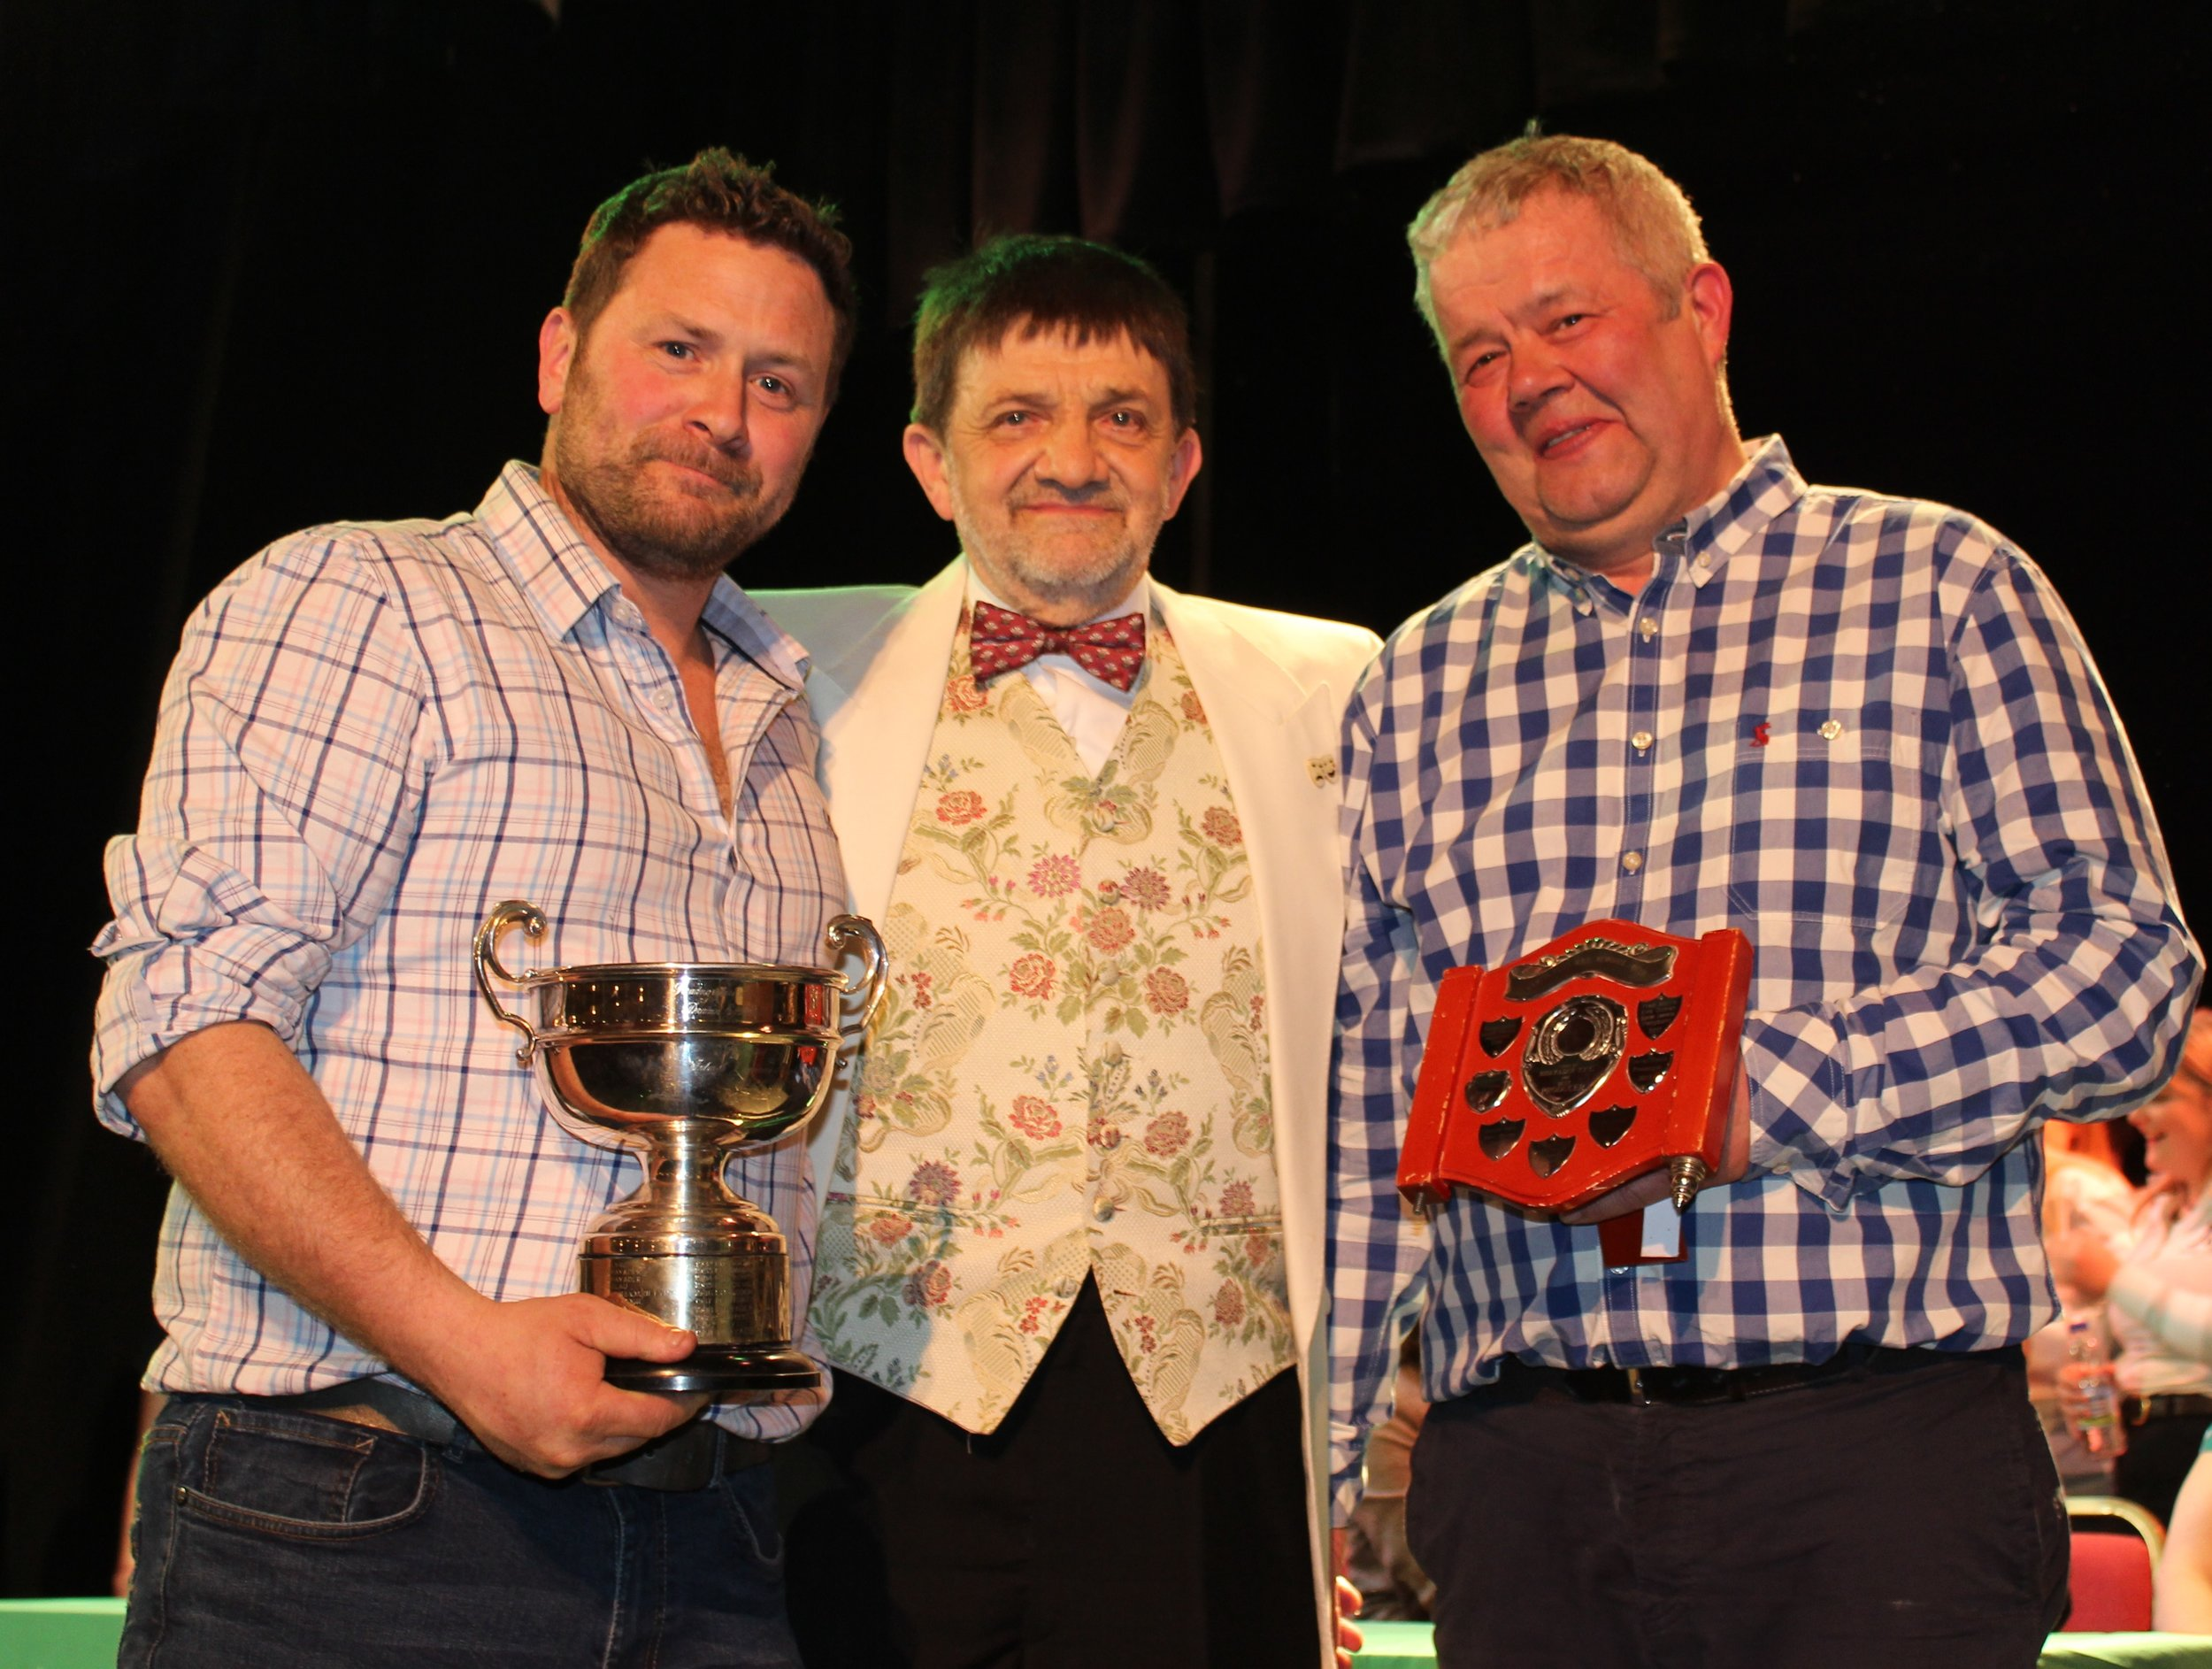 James Powell & Gwyn Price, Llanbadarn Fynydd YFC - Martin Pugh MBE Memorial Shield for Best Producer & John & Vivienne Hughes Rose Bowl Trophy for 1st Place.